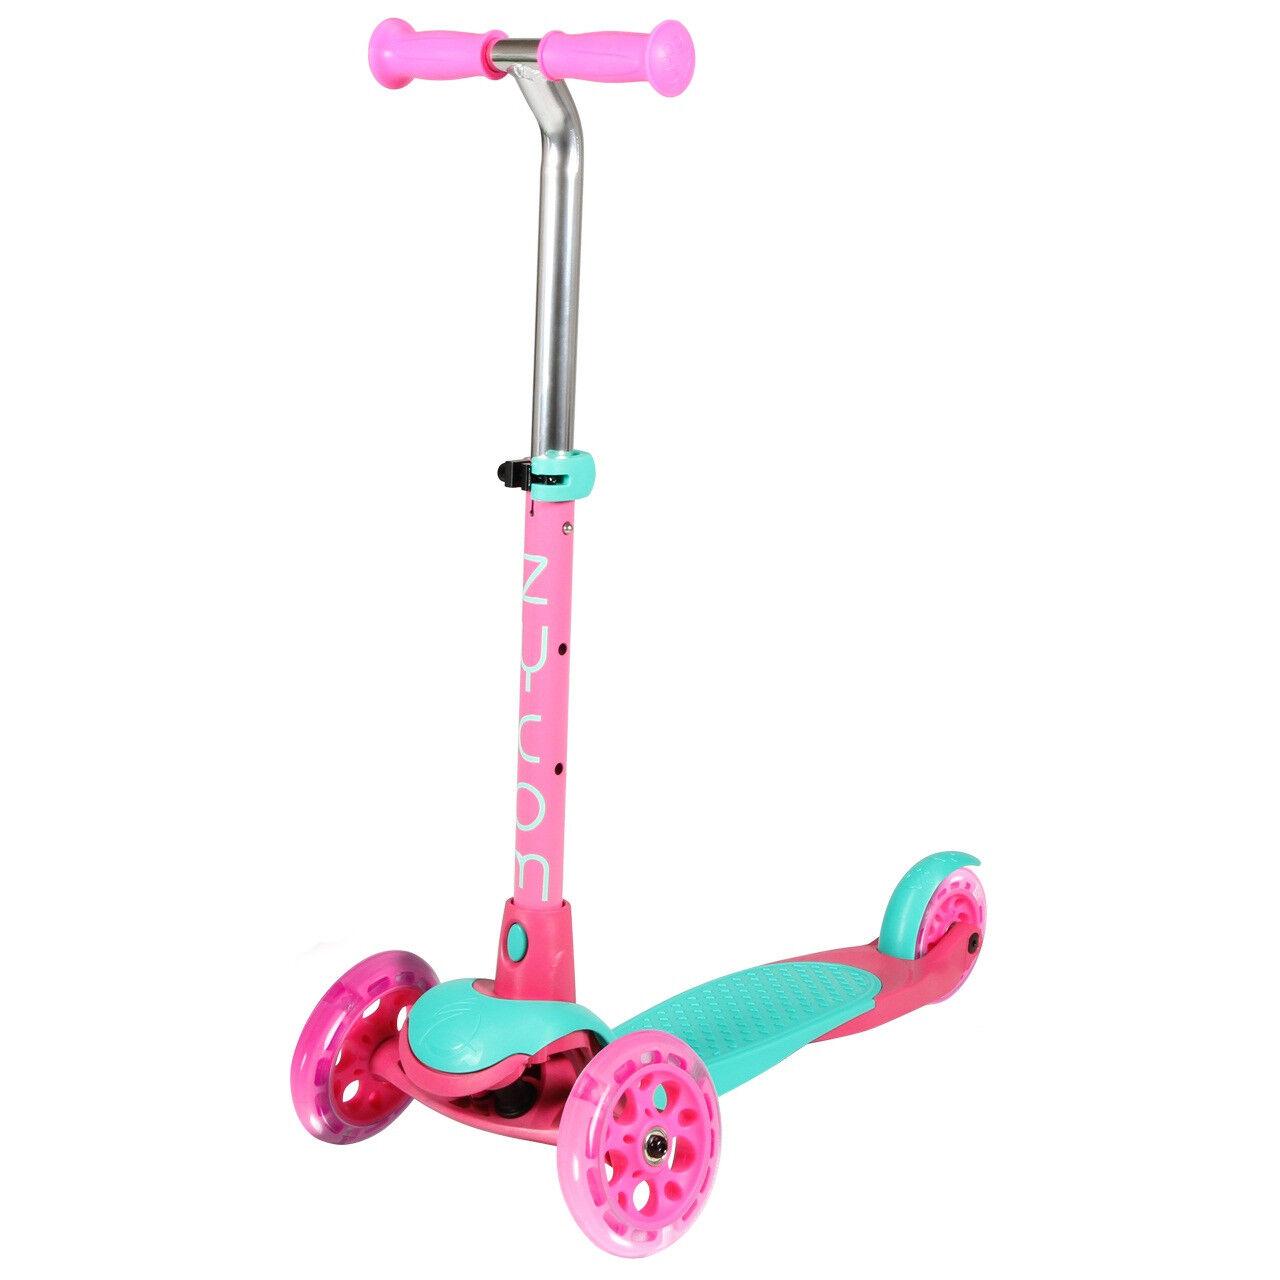 Zycom Zing Kids 3 Wheel Adjustable Scooter W  Light Up Wheels - Teal Pink